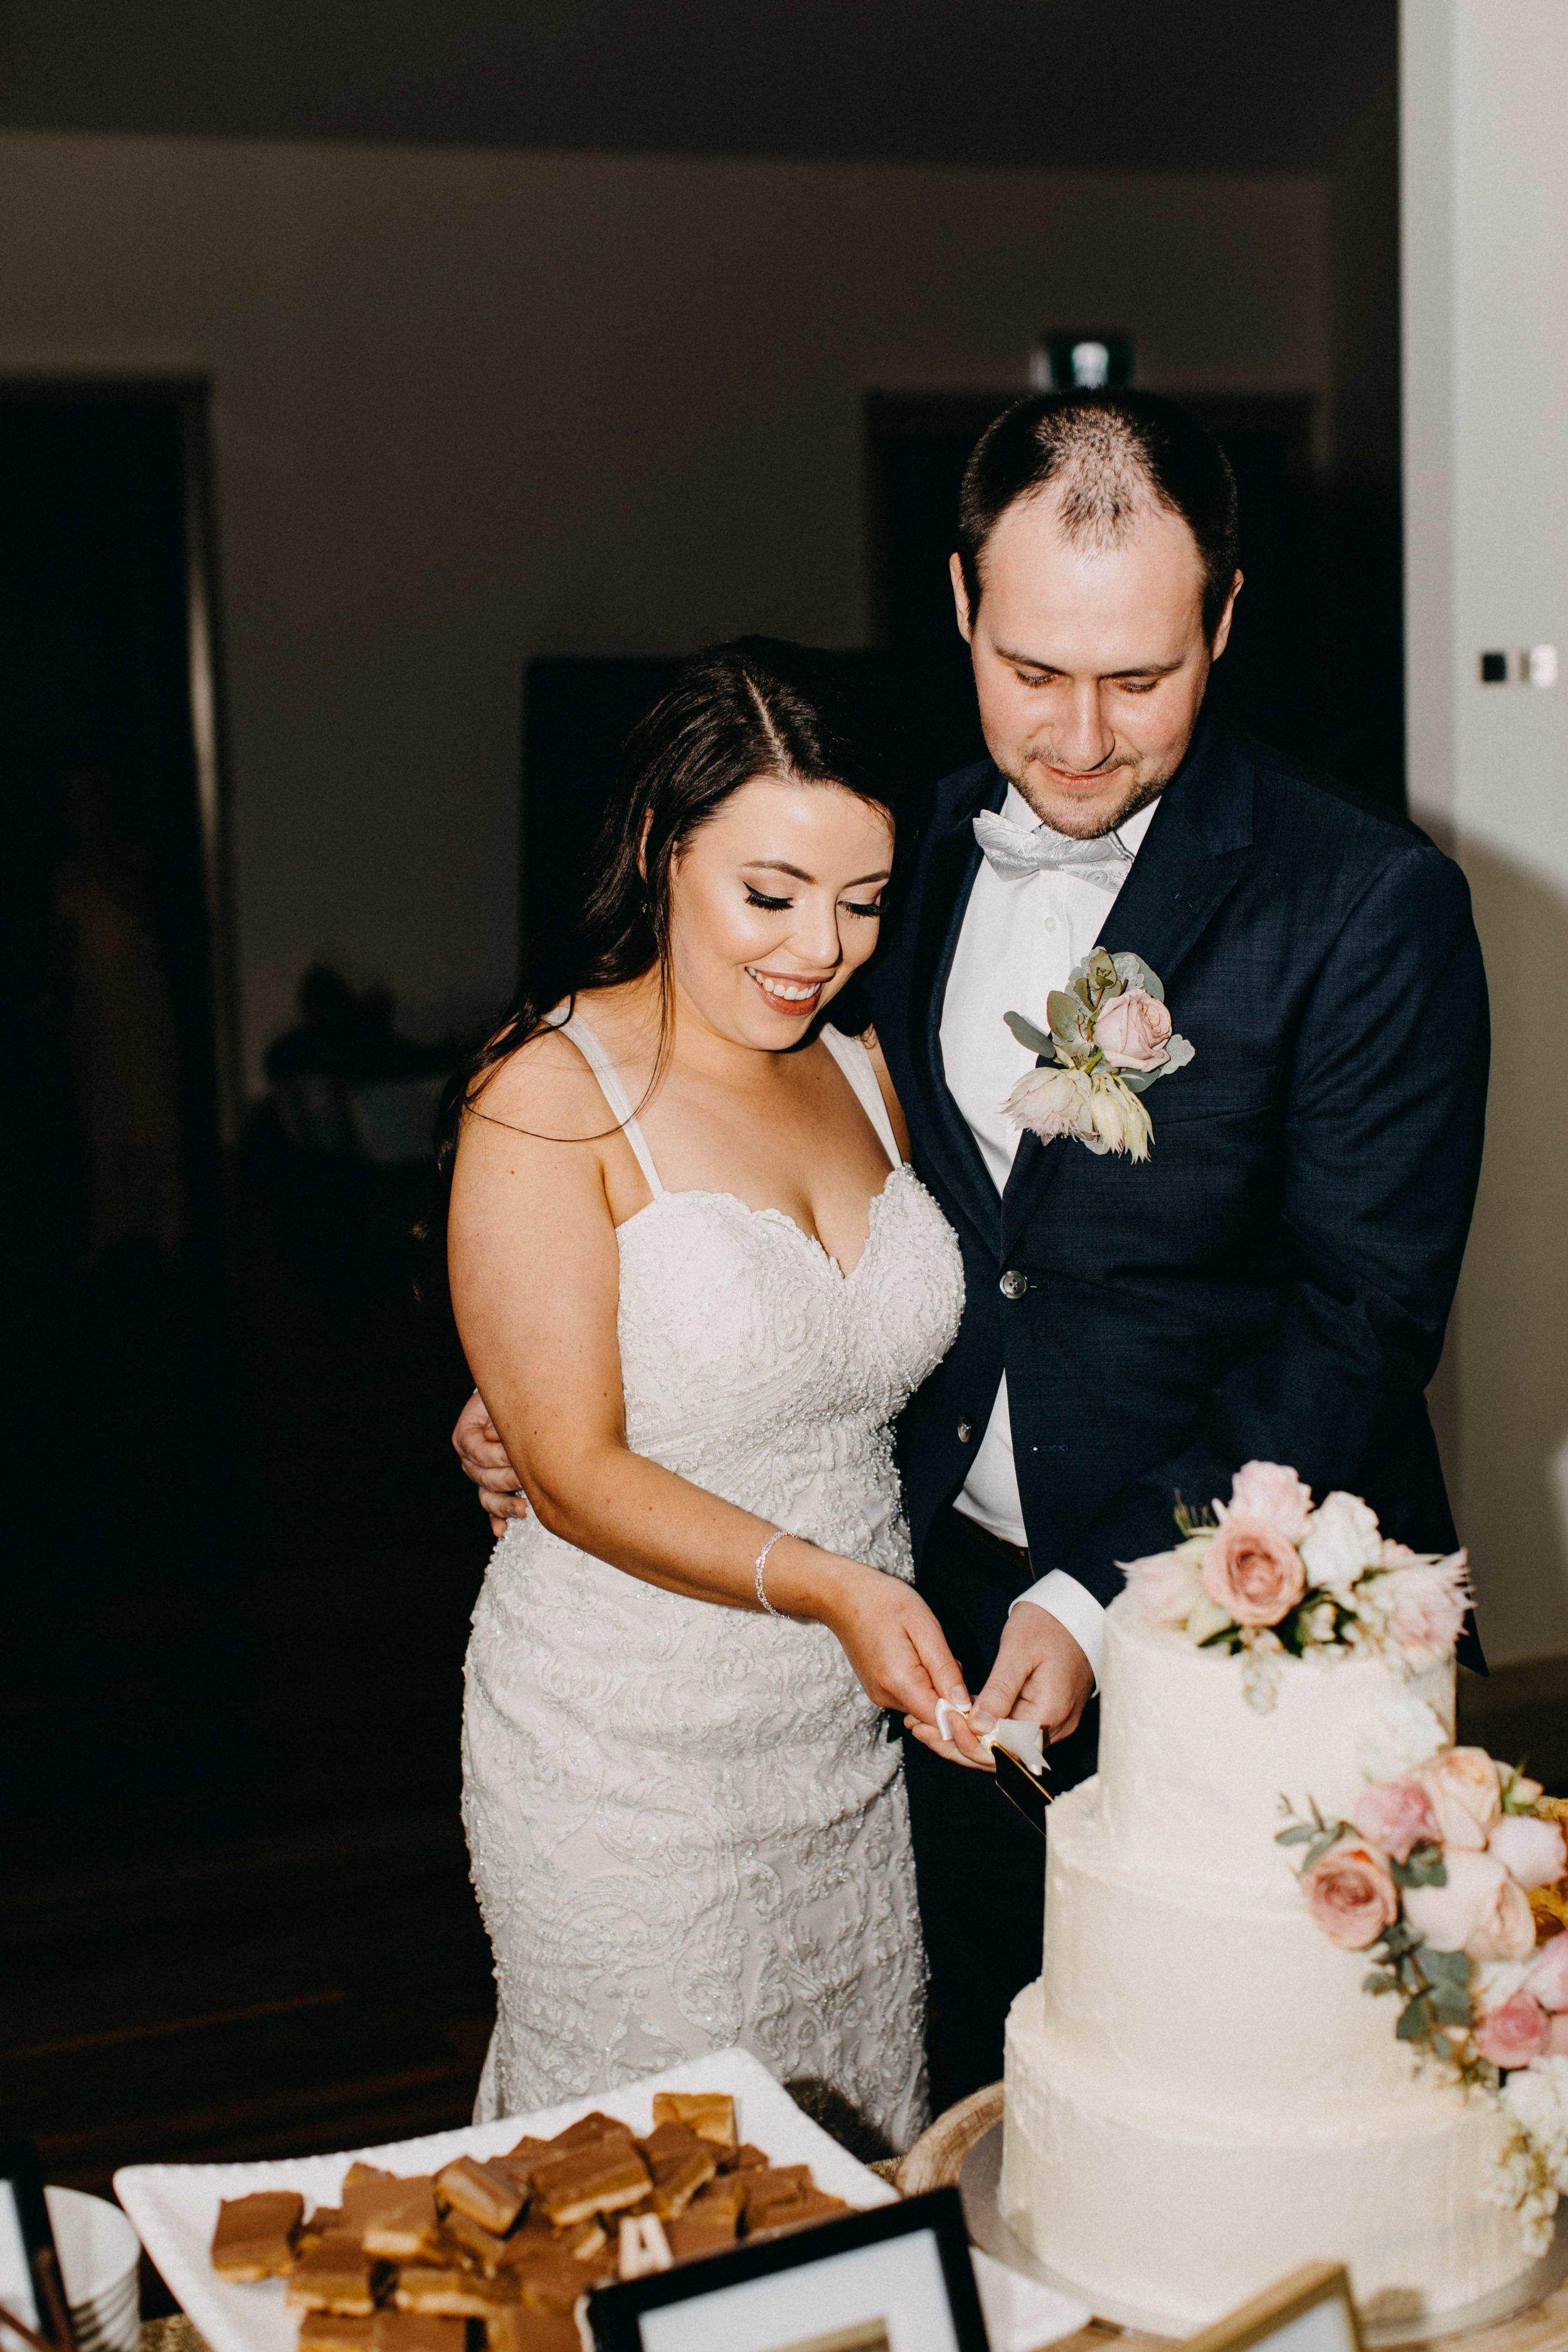 exeter-southern-highlands-wedding-www.emilyobrienphotography.net -145.jpg